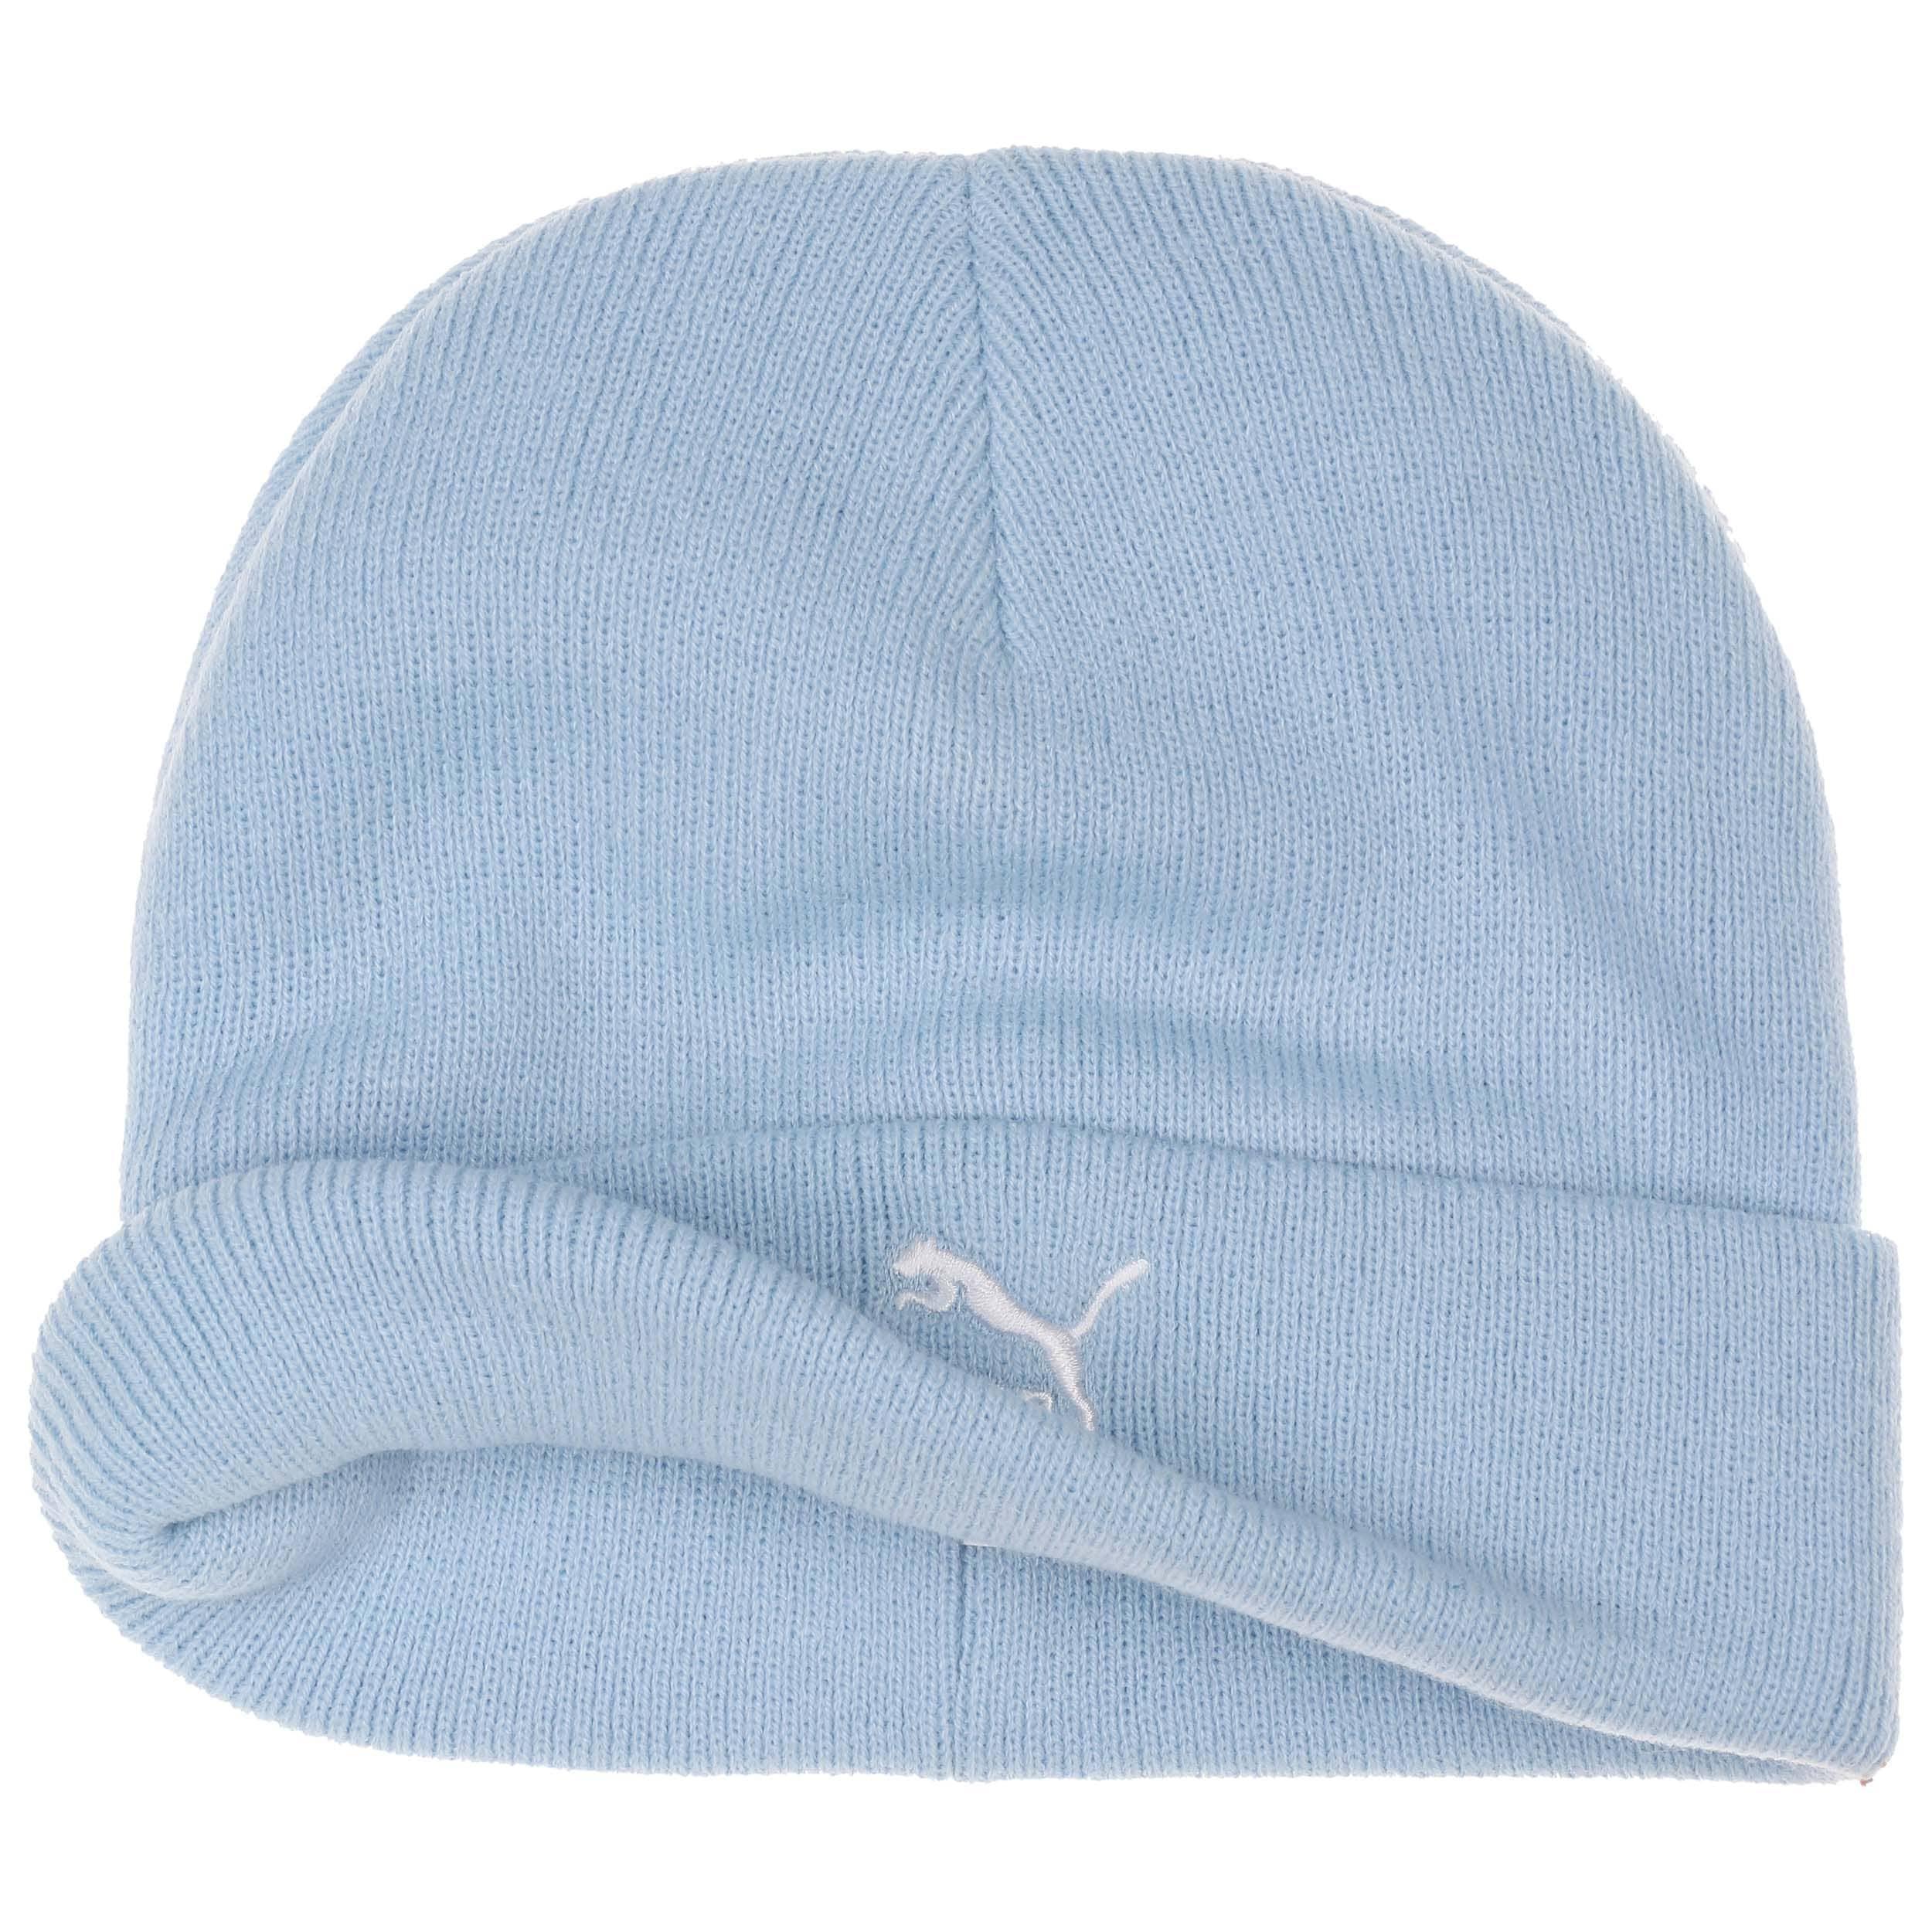 7026401ba57 ... Mid Fit Beanie Hat by PUMA - light blue 1 ...